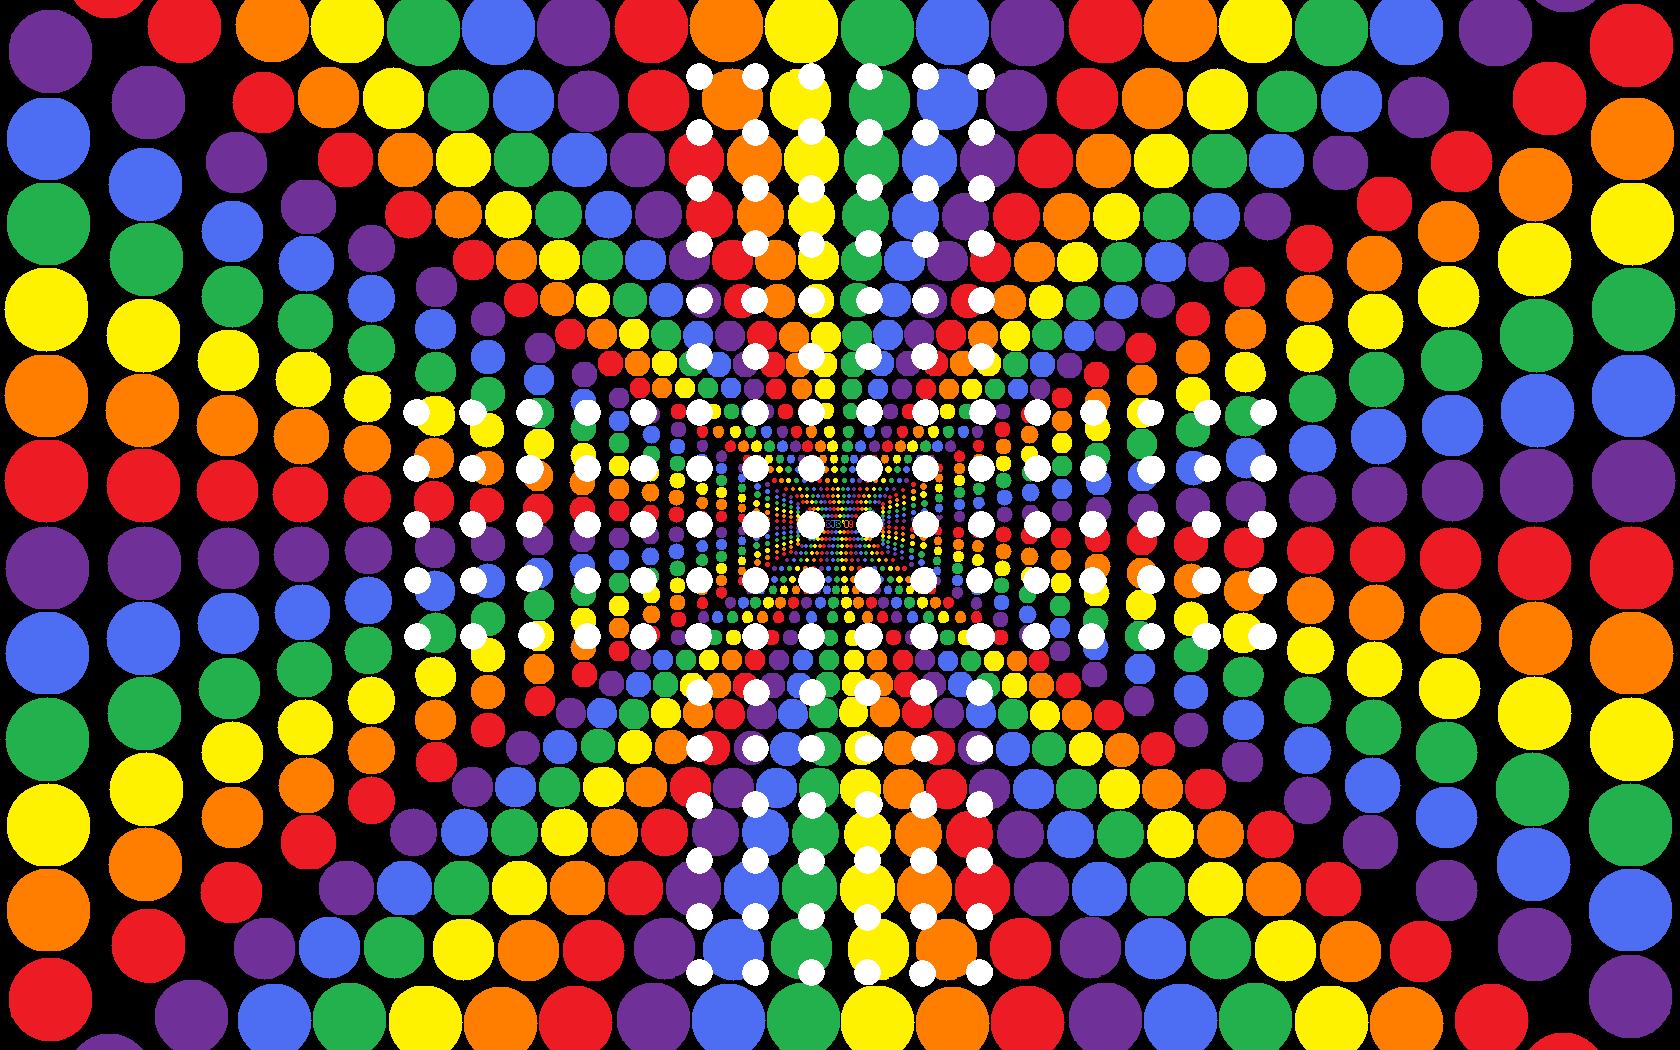 Hd wallpaper colorful - Colorful Wallpaper Hd 1680x1050 Free Wallpaper Full Hd 1080p